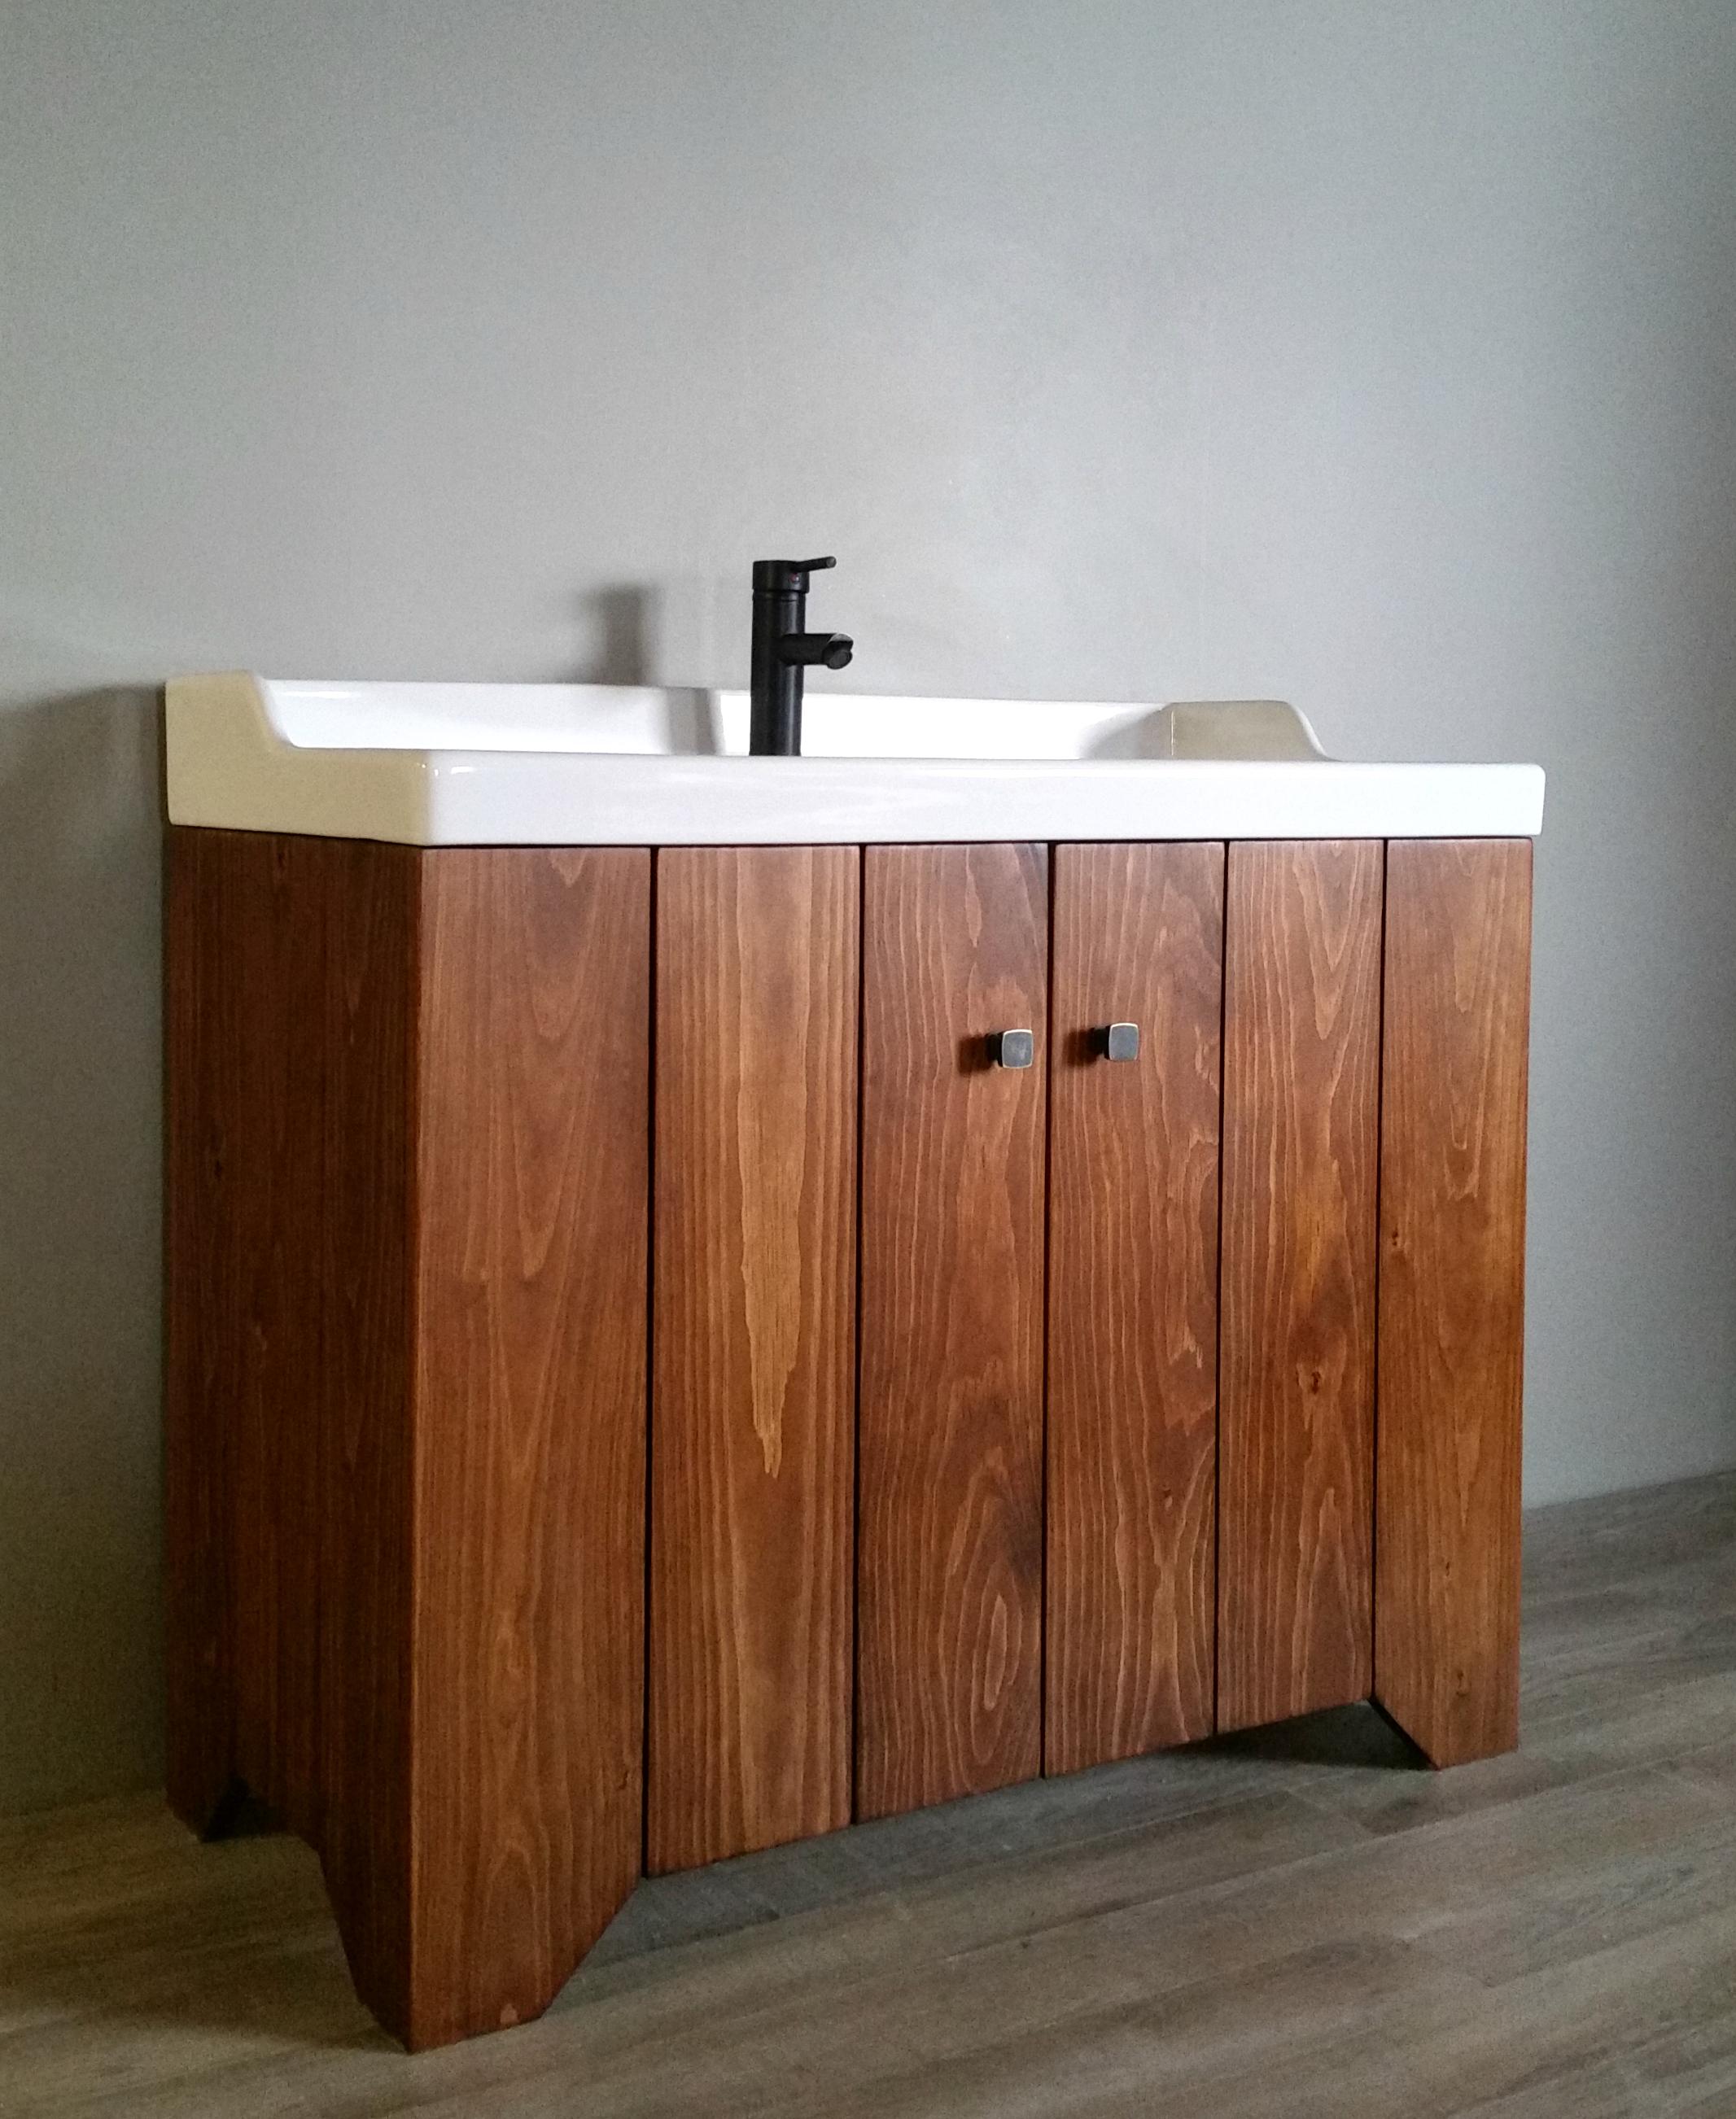 Custom Built Solid Wood 40 Bathroom Vanity With A Ceramic Sink